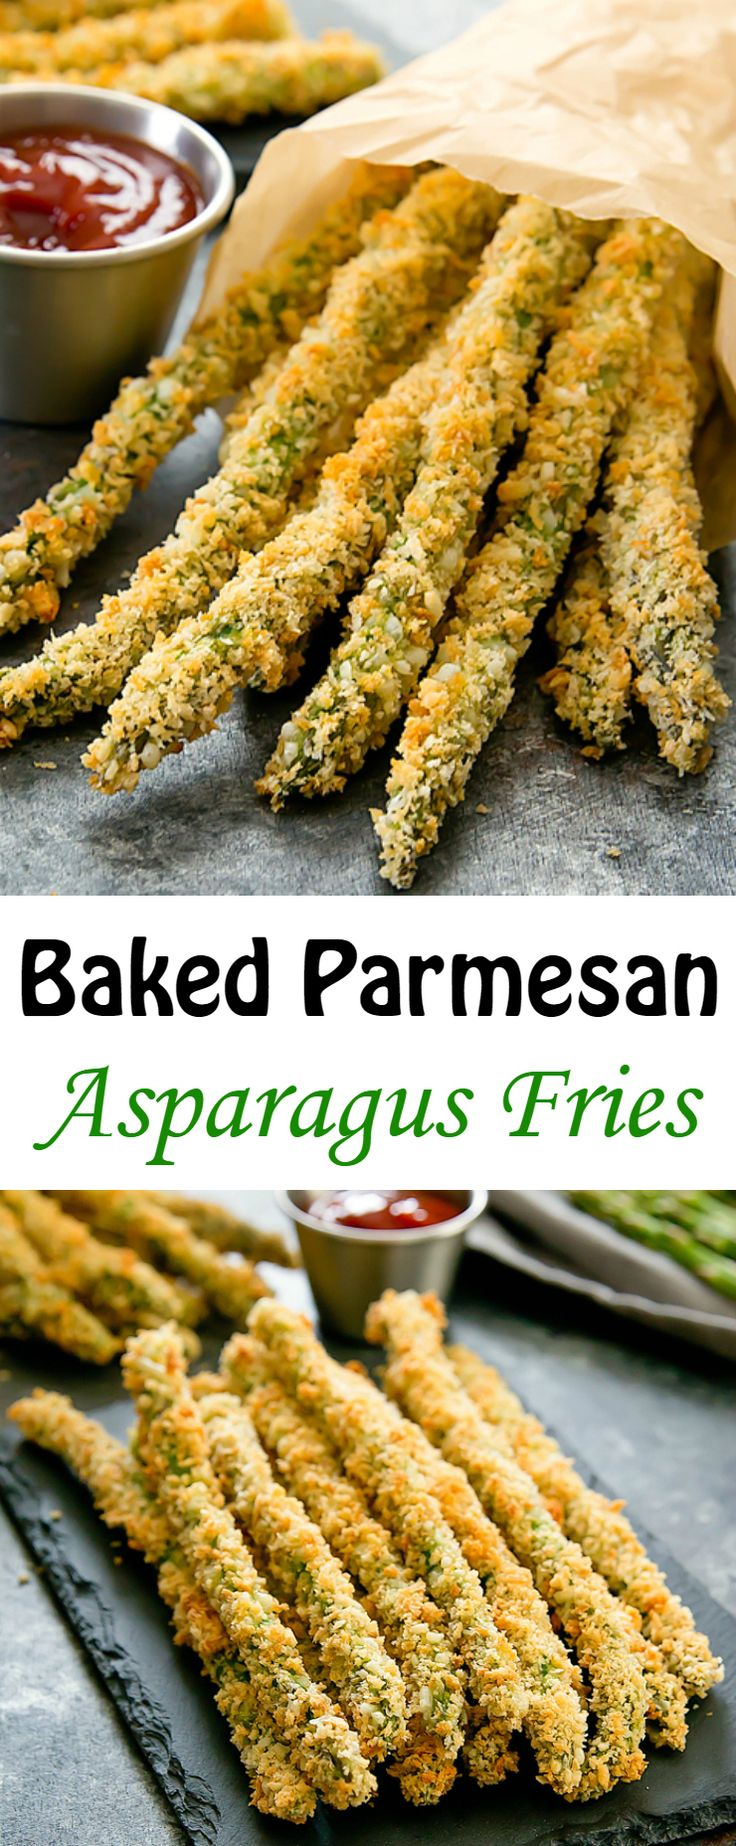 Crispy Baked Parmesan Asparagus Fries